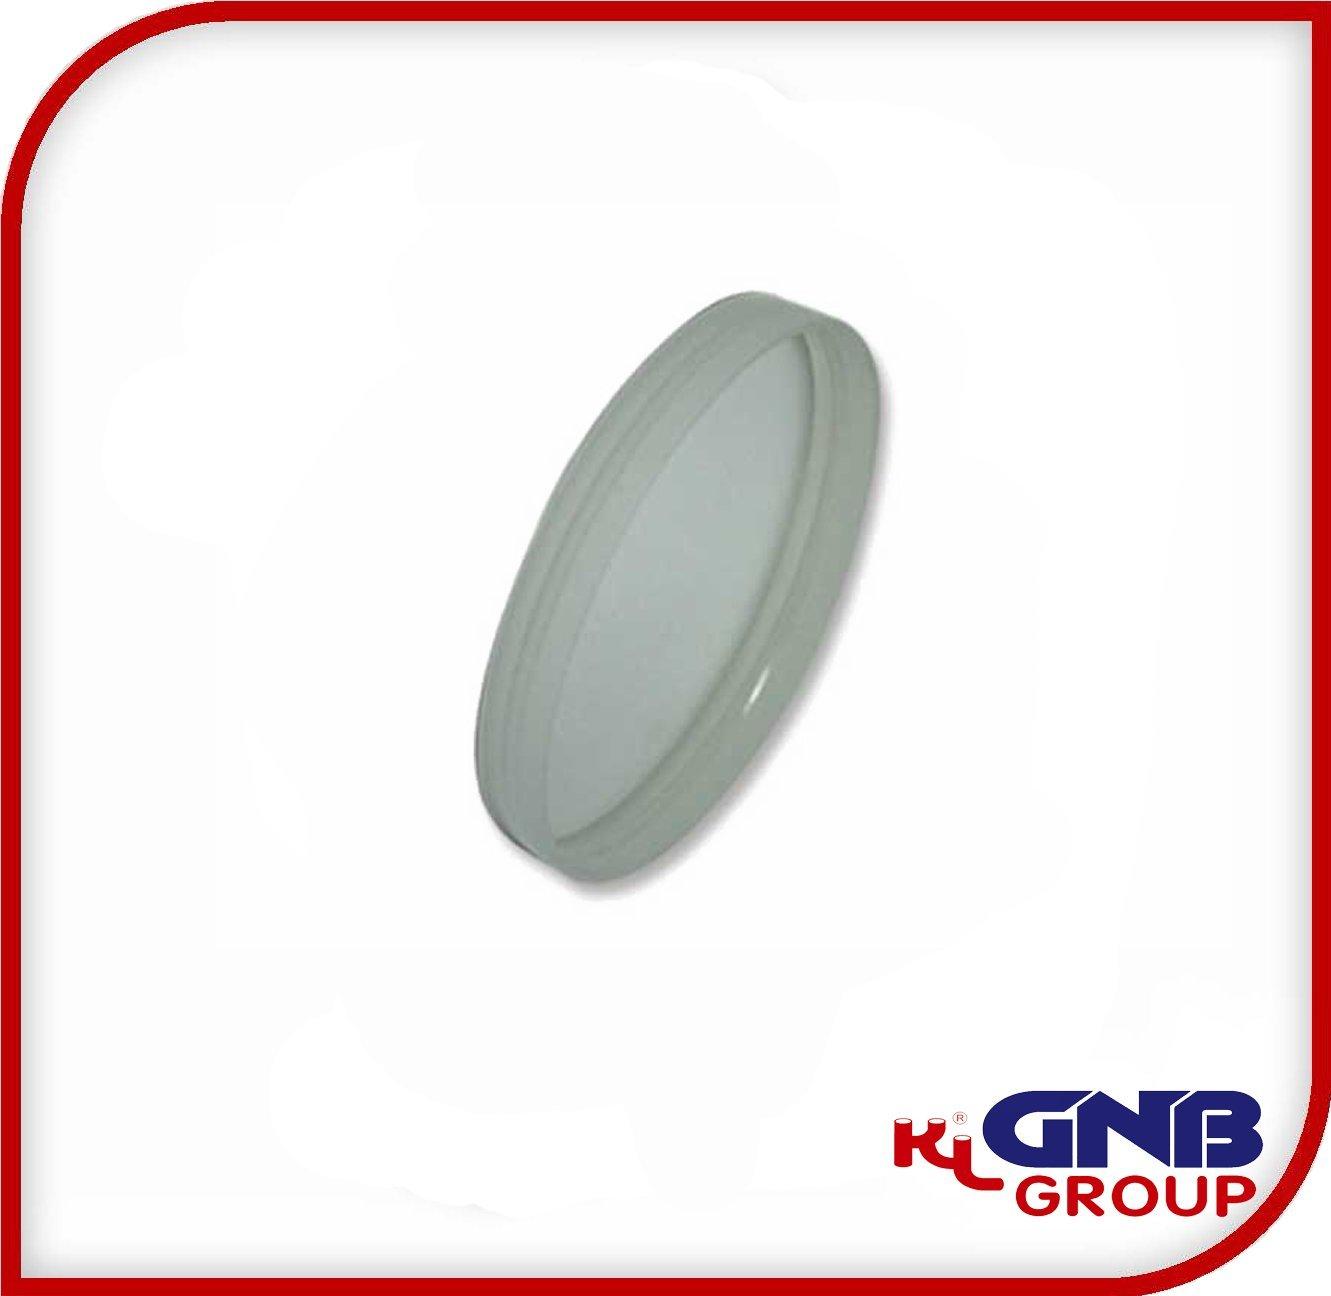 Plastic Caps, CF133 Flange - Mounting Hardware